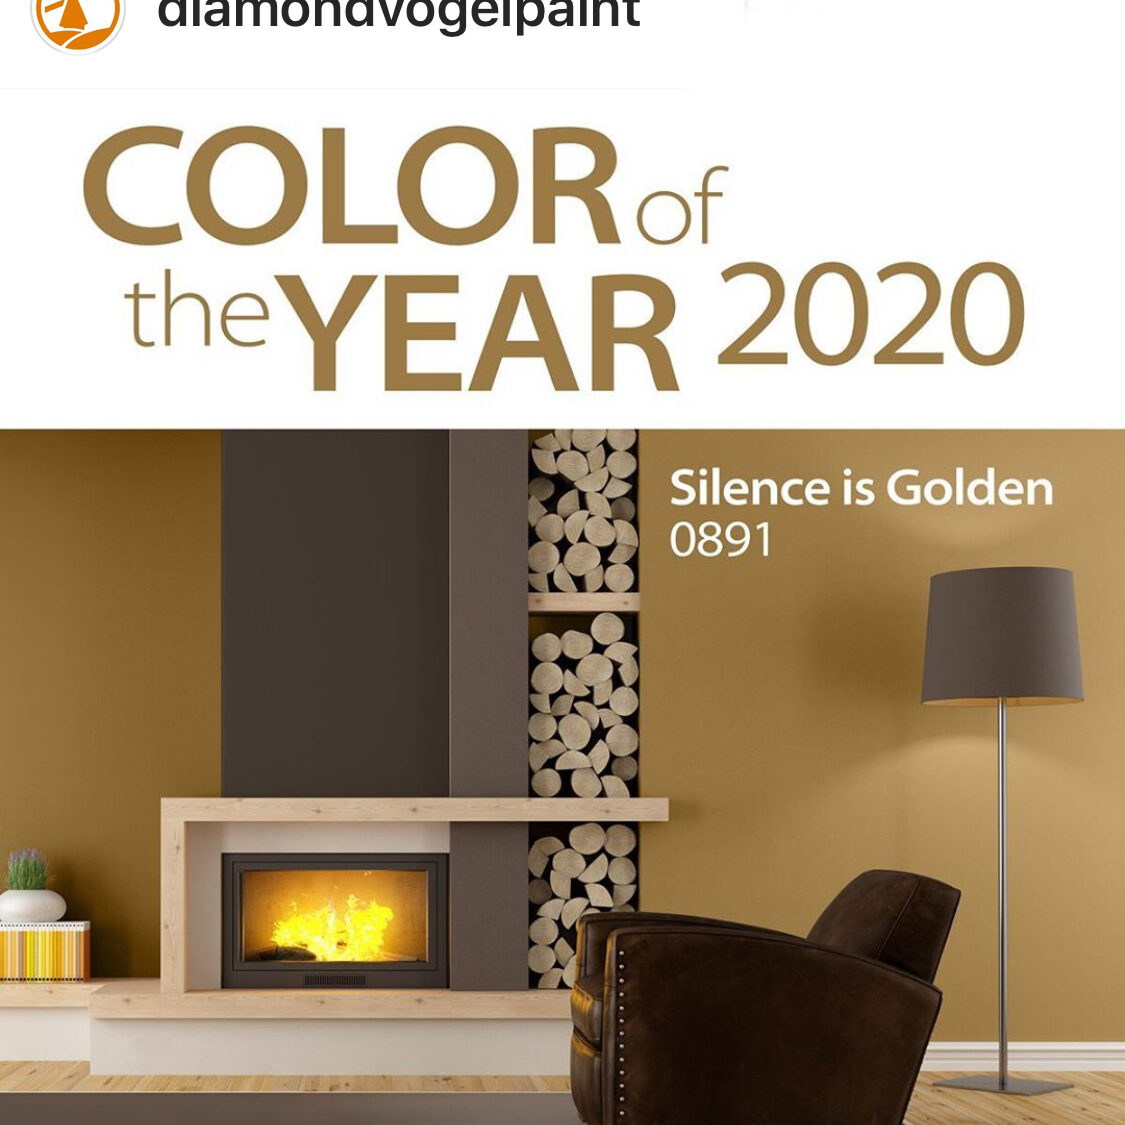 Diamond Vogel's Color of 2020